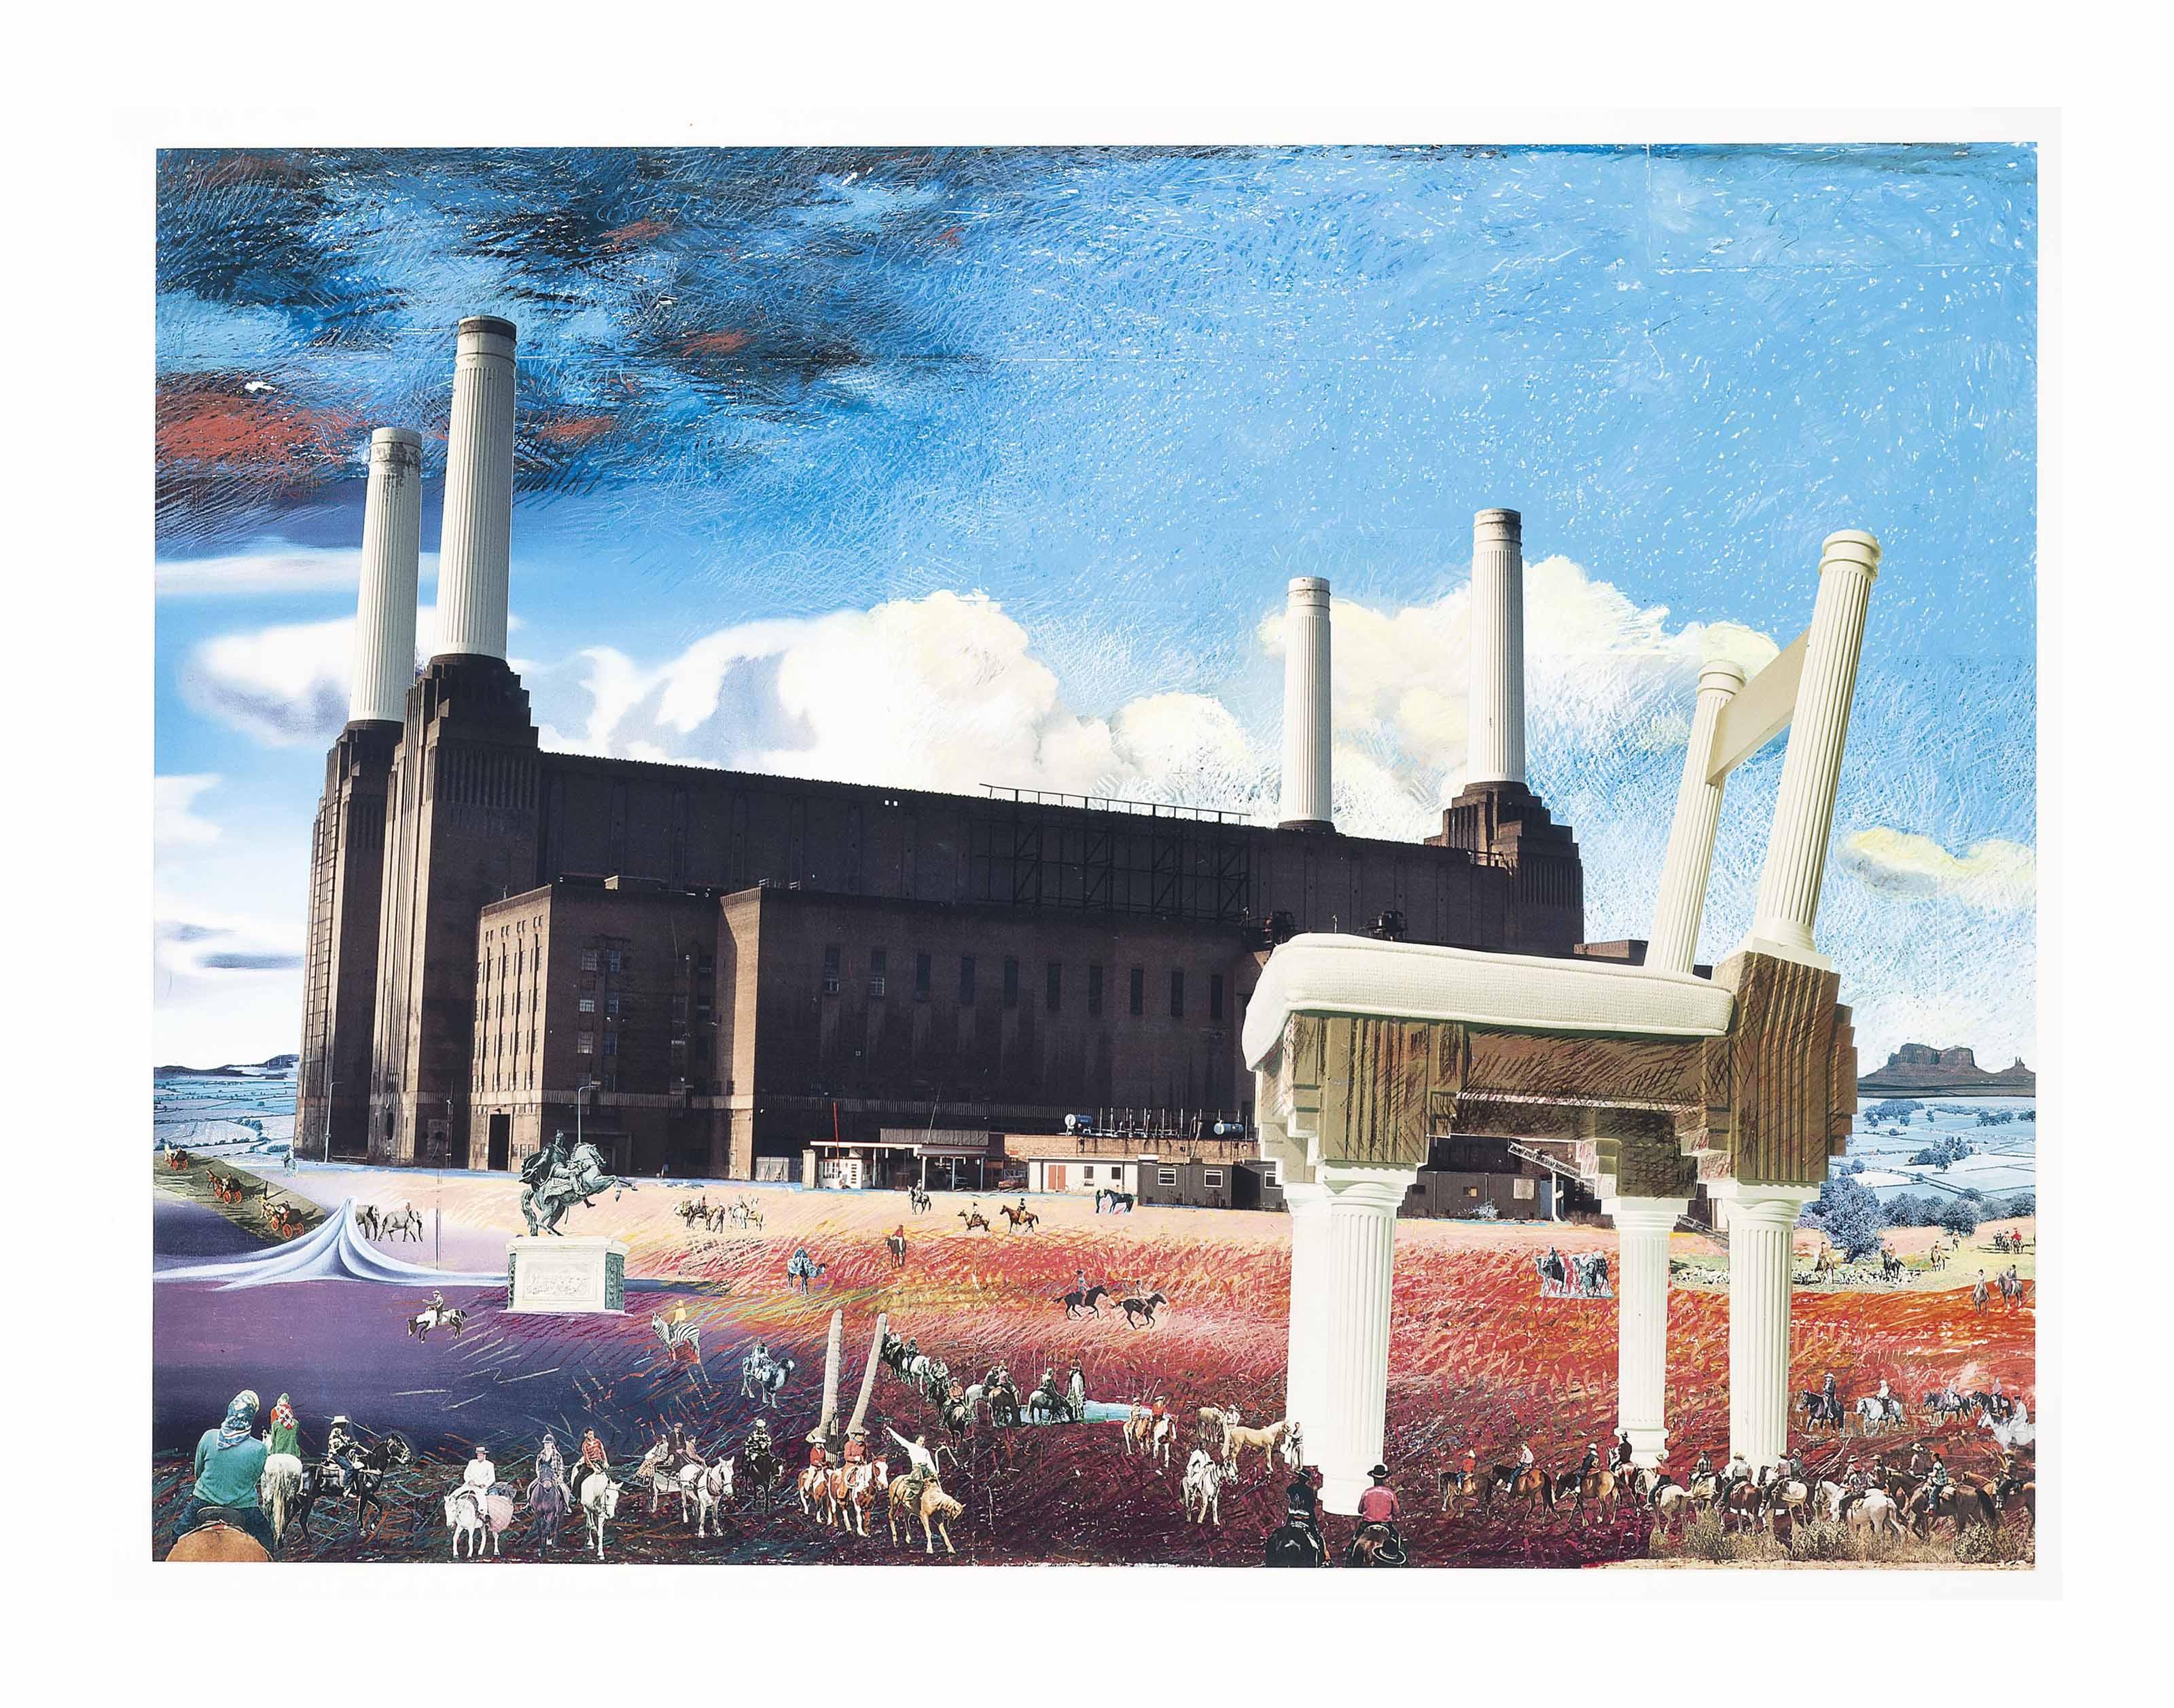 Battersea Power station: Wild West